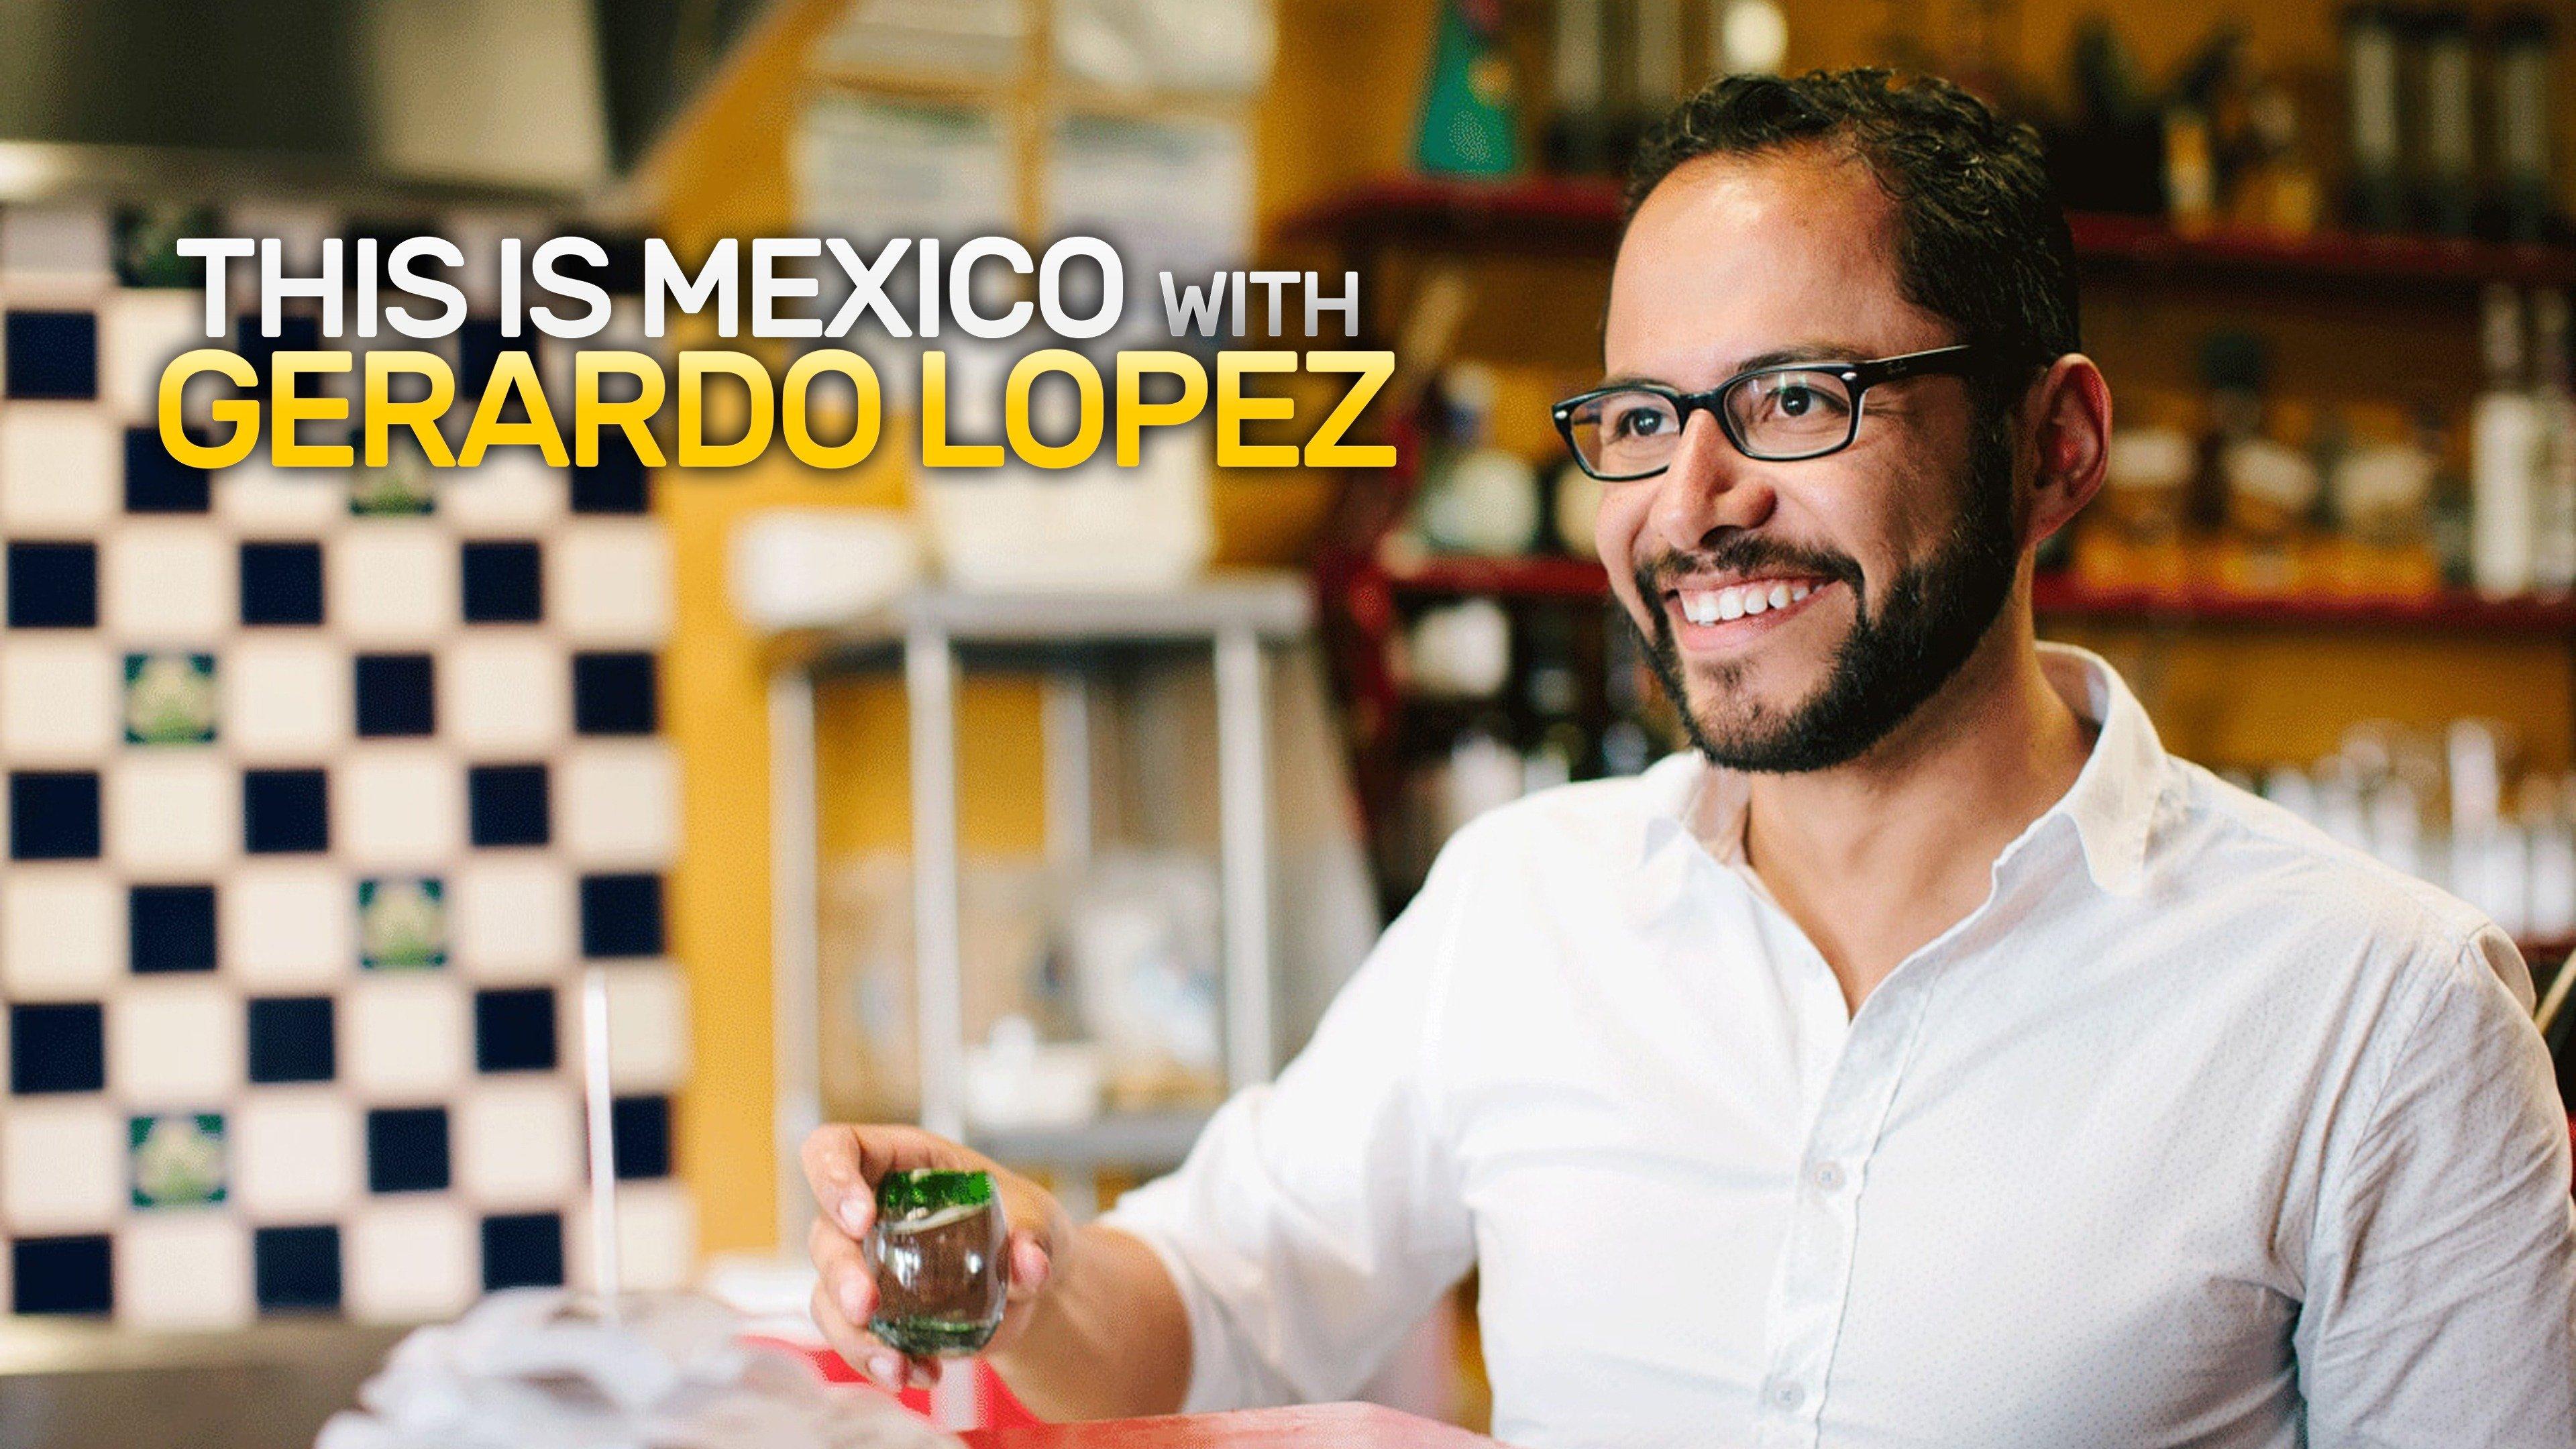 This is Mexico with Gerardo Lopez